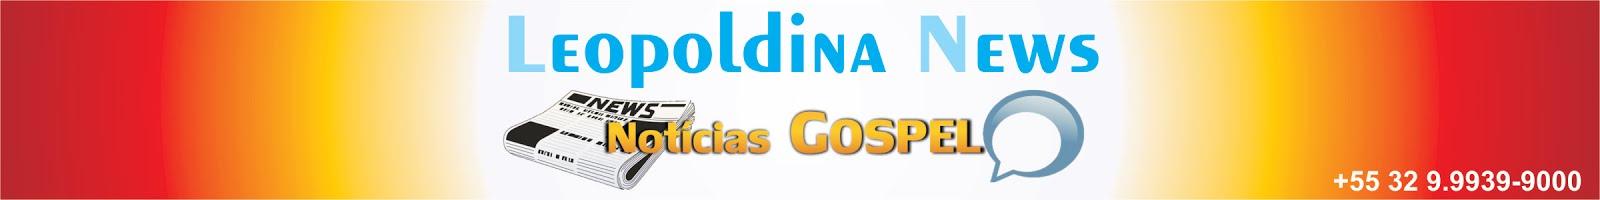 Leopoldina News